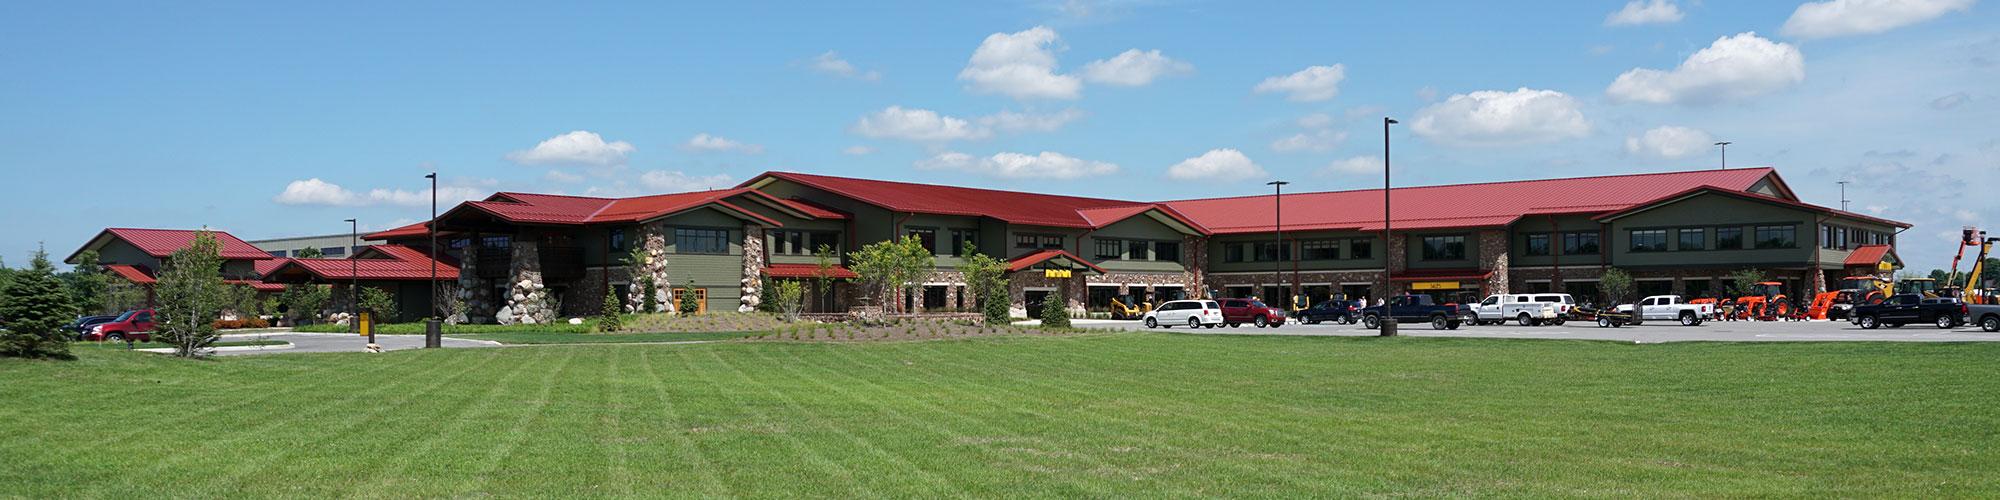 MacAllister Machinery Headquarters Building